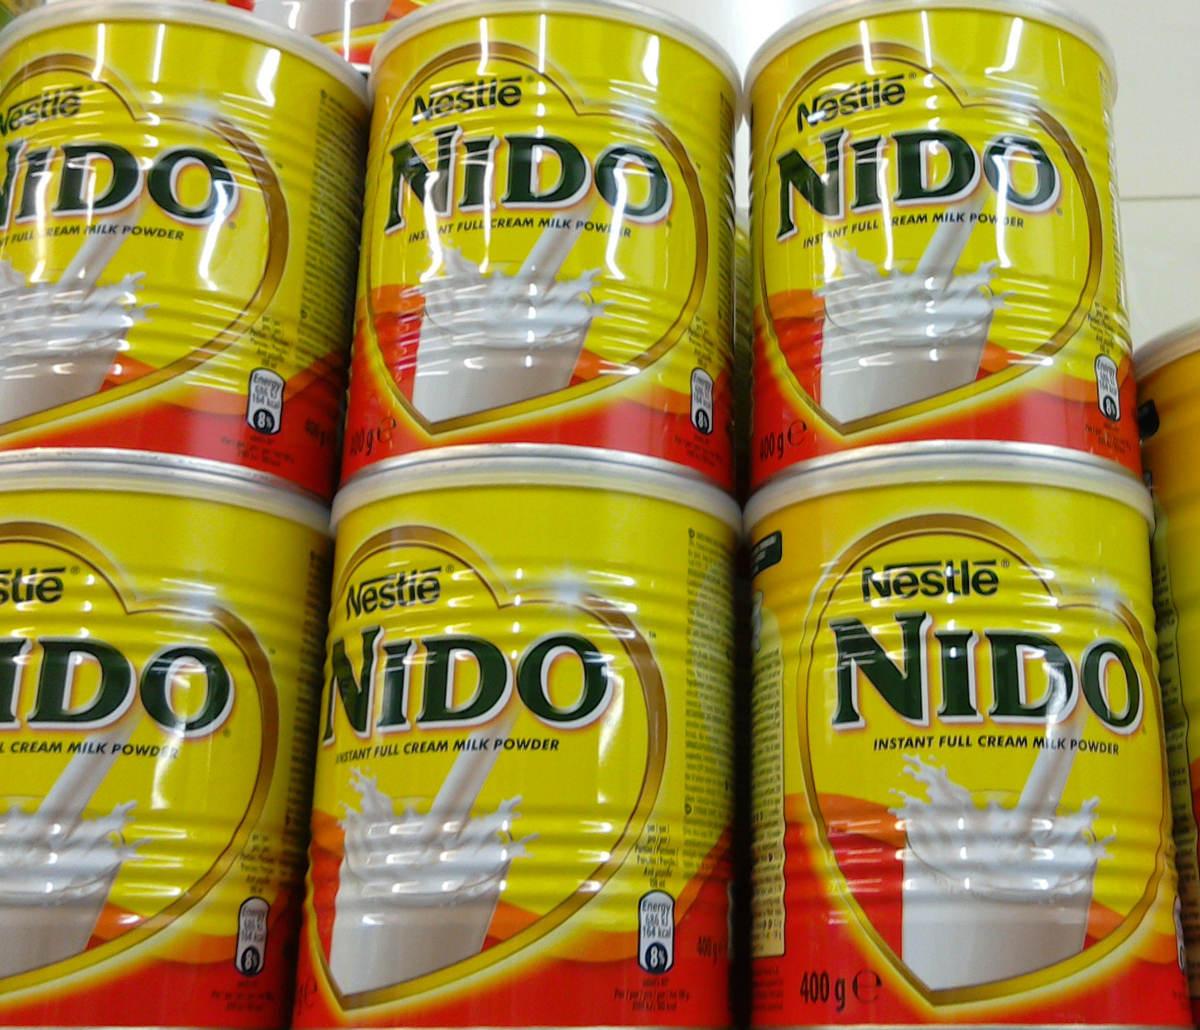 NIDO NESTLE SUPPLIERS